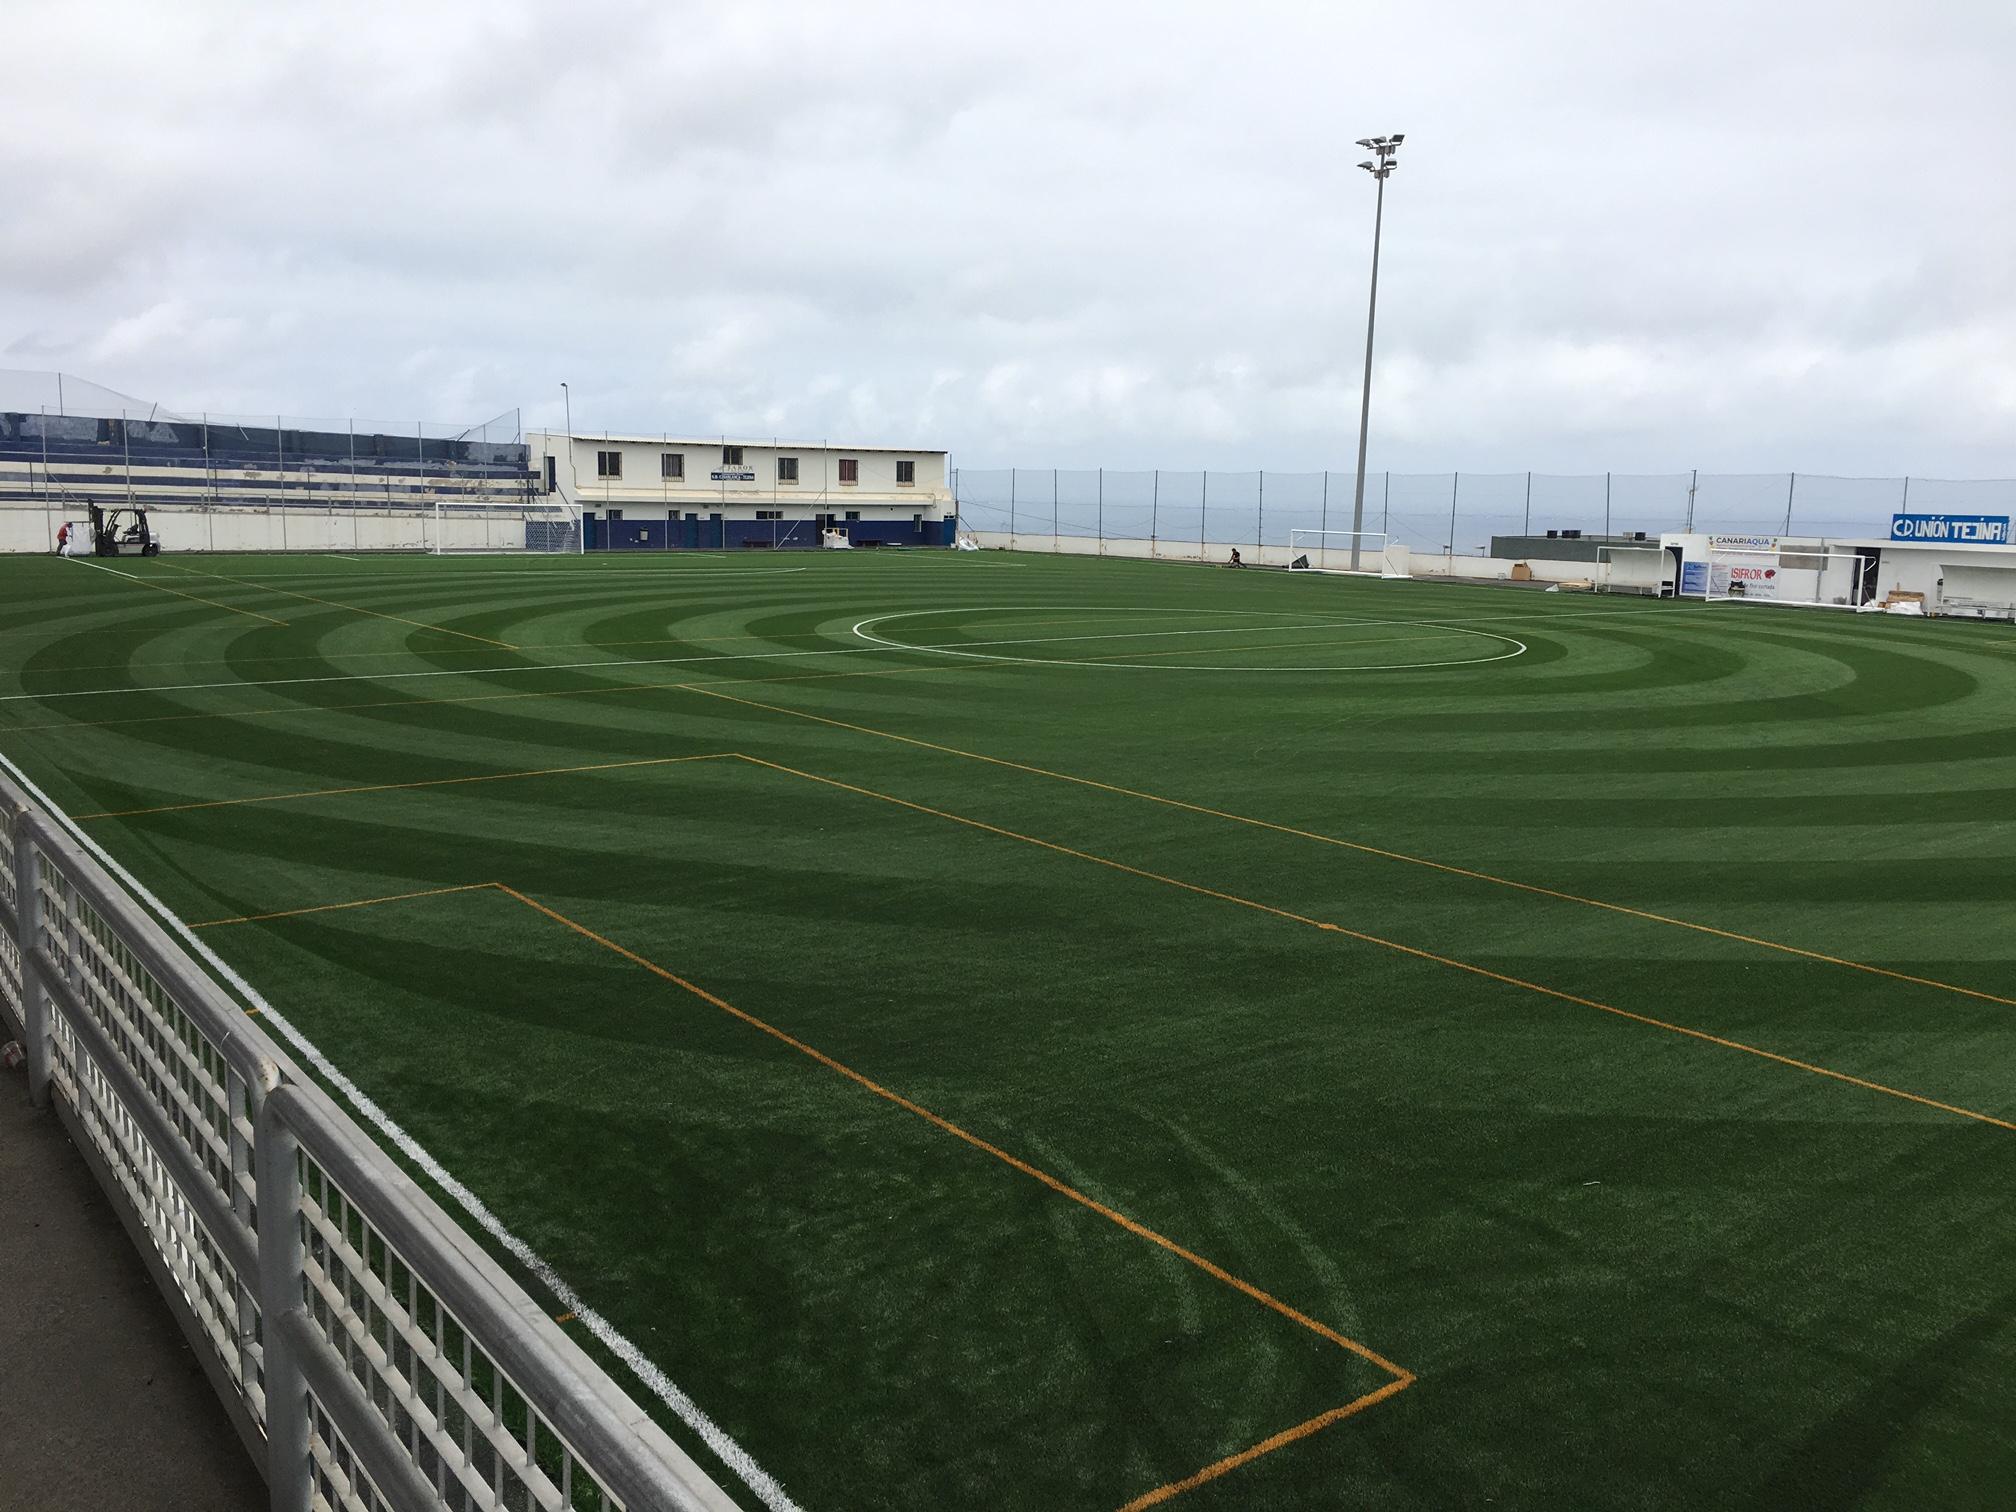 Campo de Fútbol Izquierdo Rodríguez, San Cristobal de la Laguna, Tenerife Image